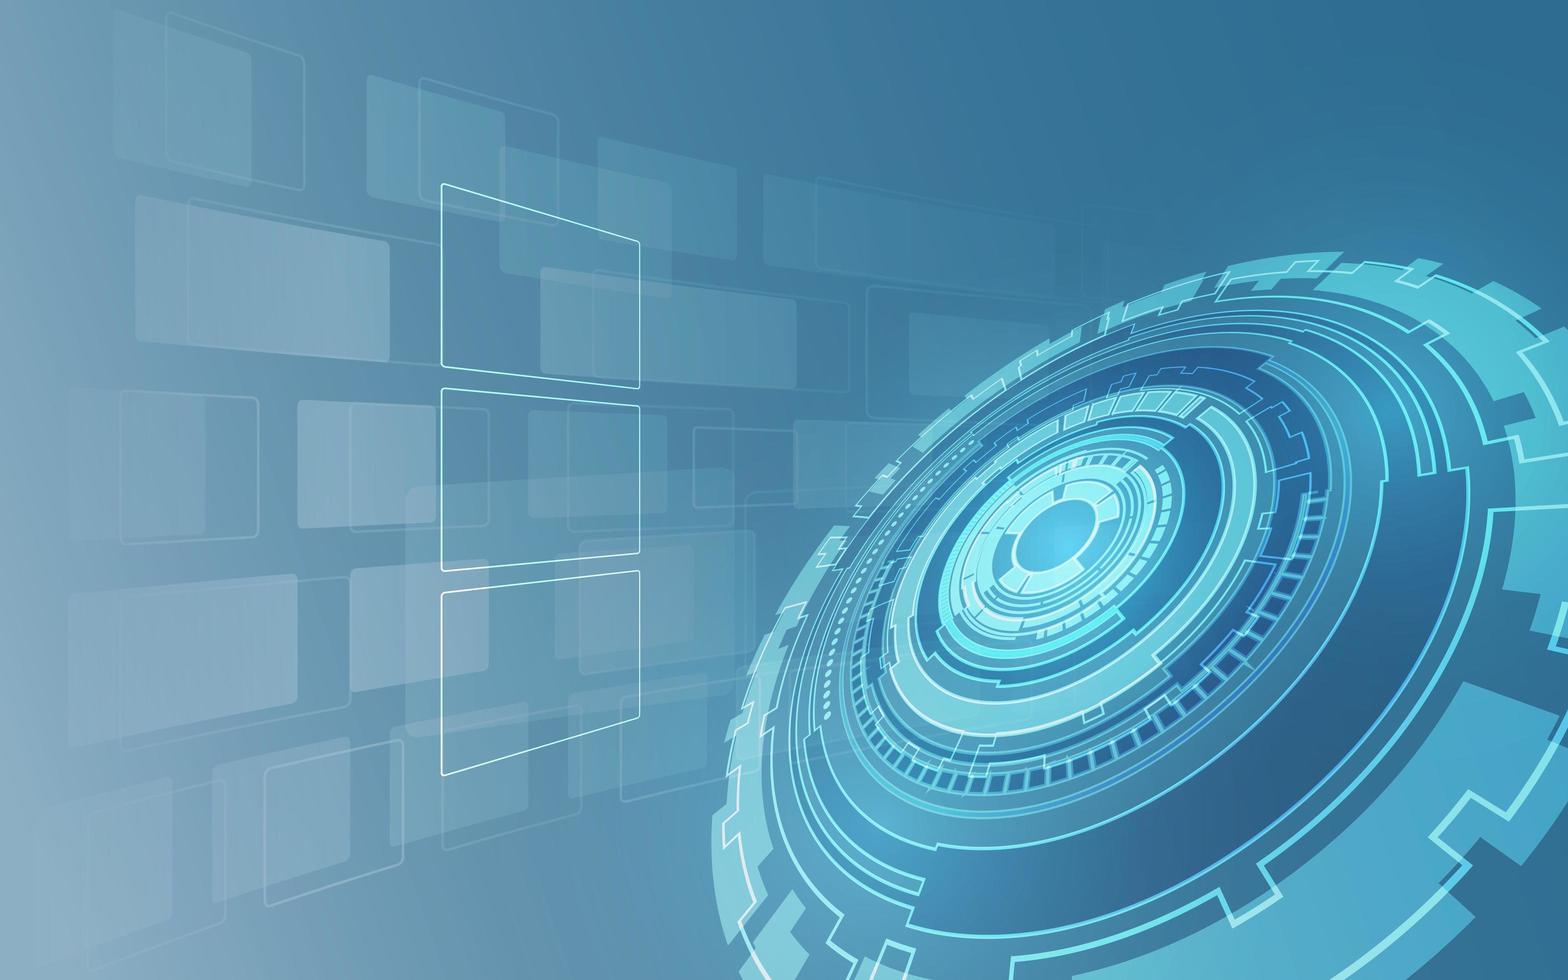 tech sci fi digital futuristisk koncept bakgrund vektor